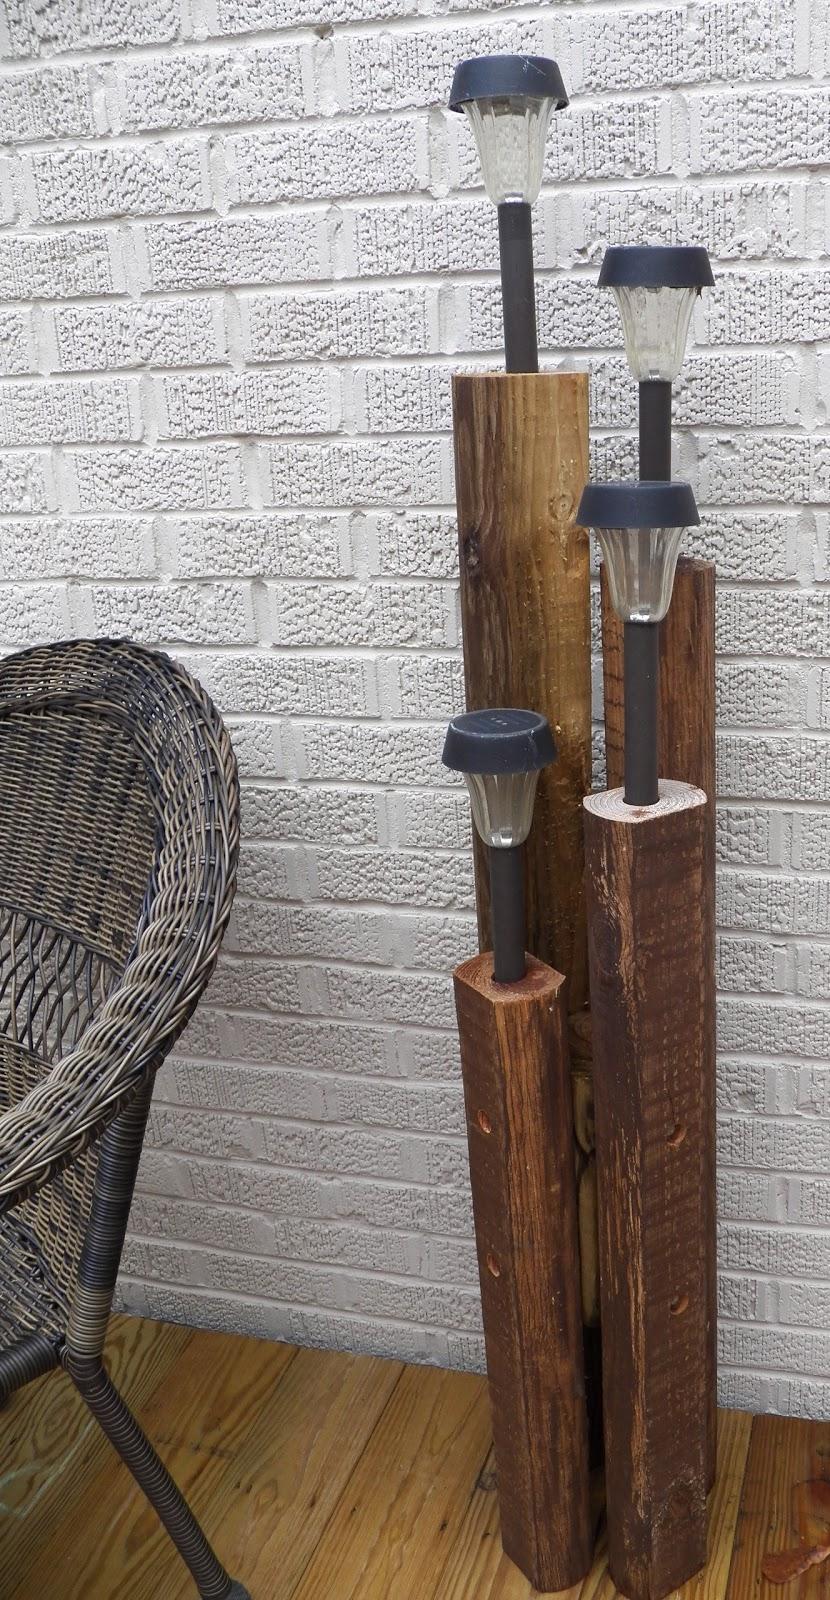 5.SIMPHOME.COM 10 DIY Outdoor Wood Projects DIY Solar Lights